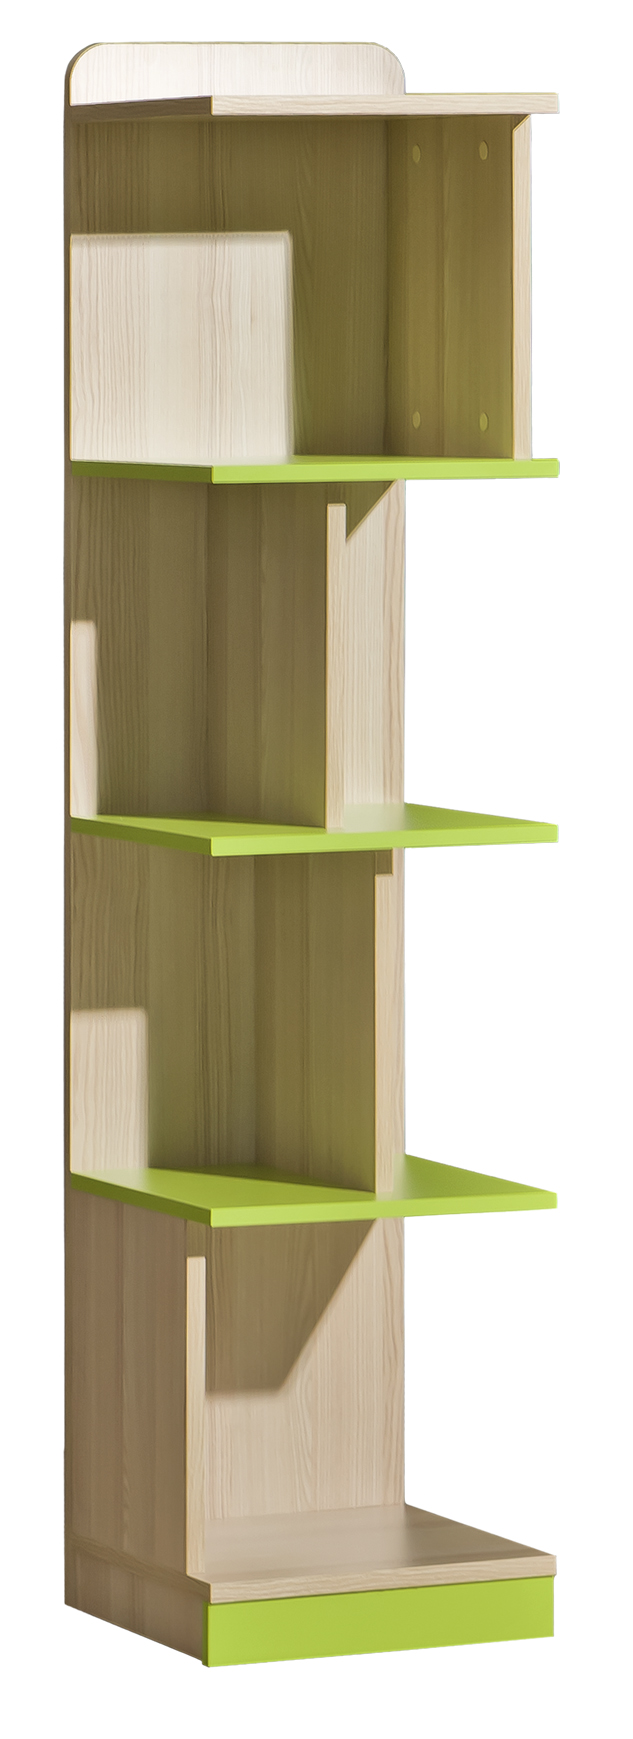 Dolmar Regál Lorento L15 Farba: Jaseň coimbra / zelená